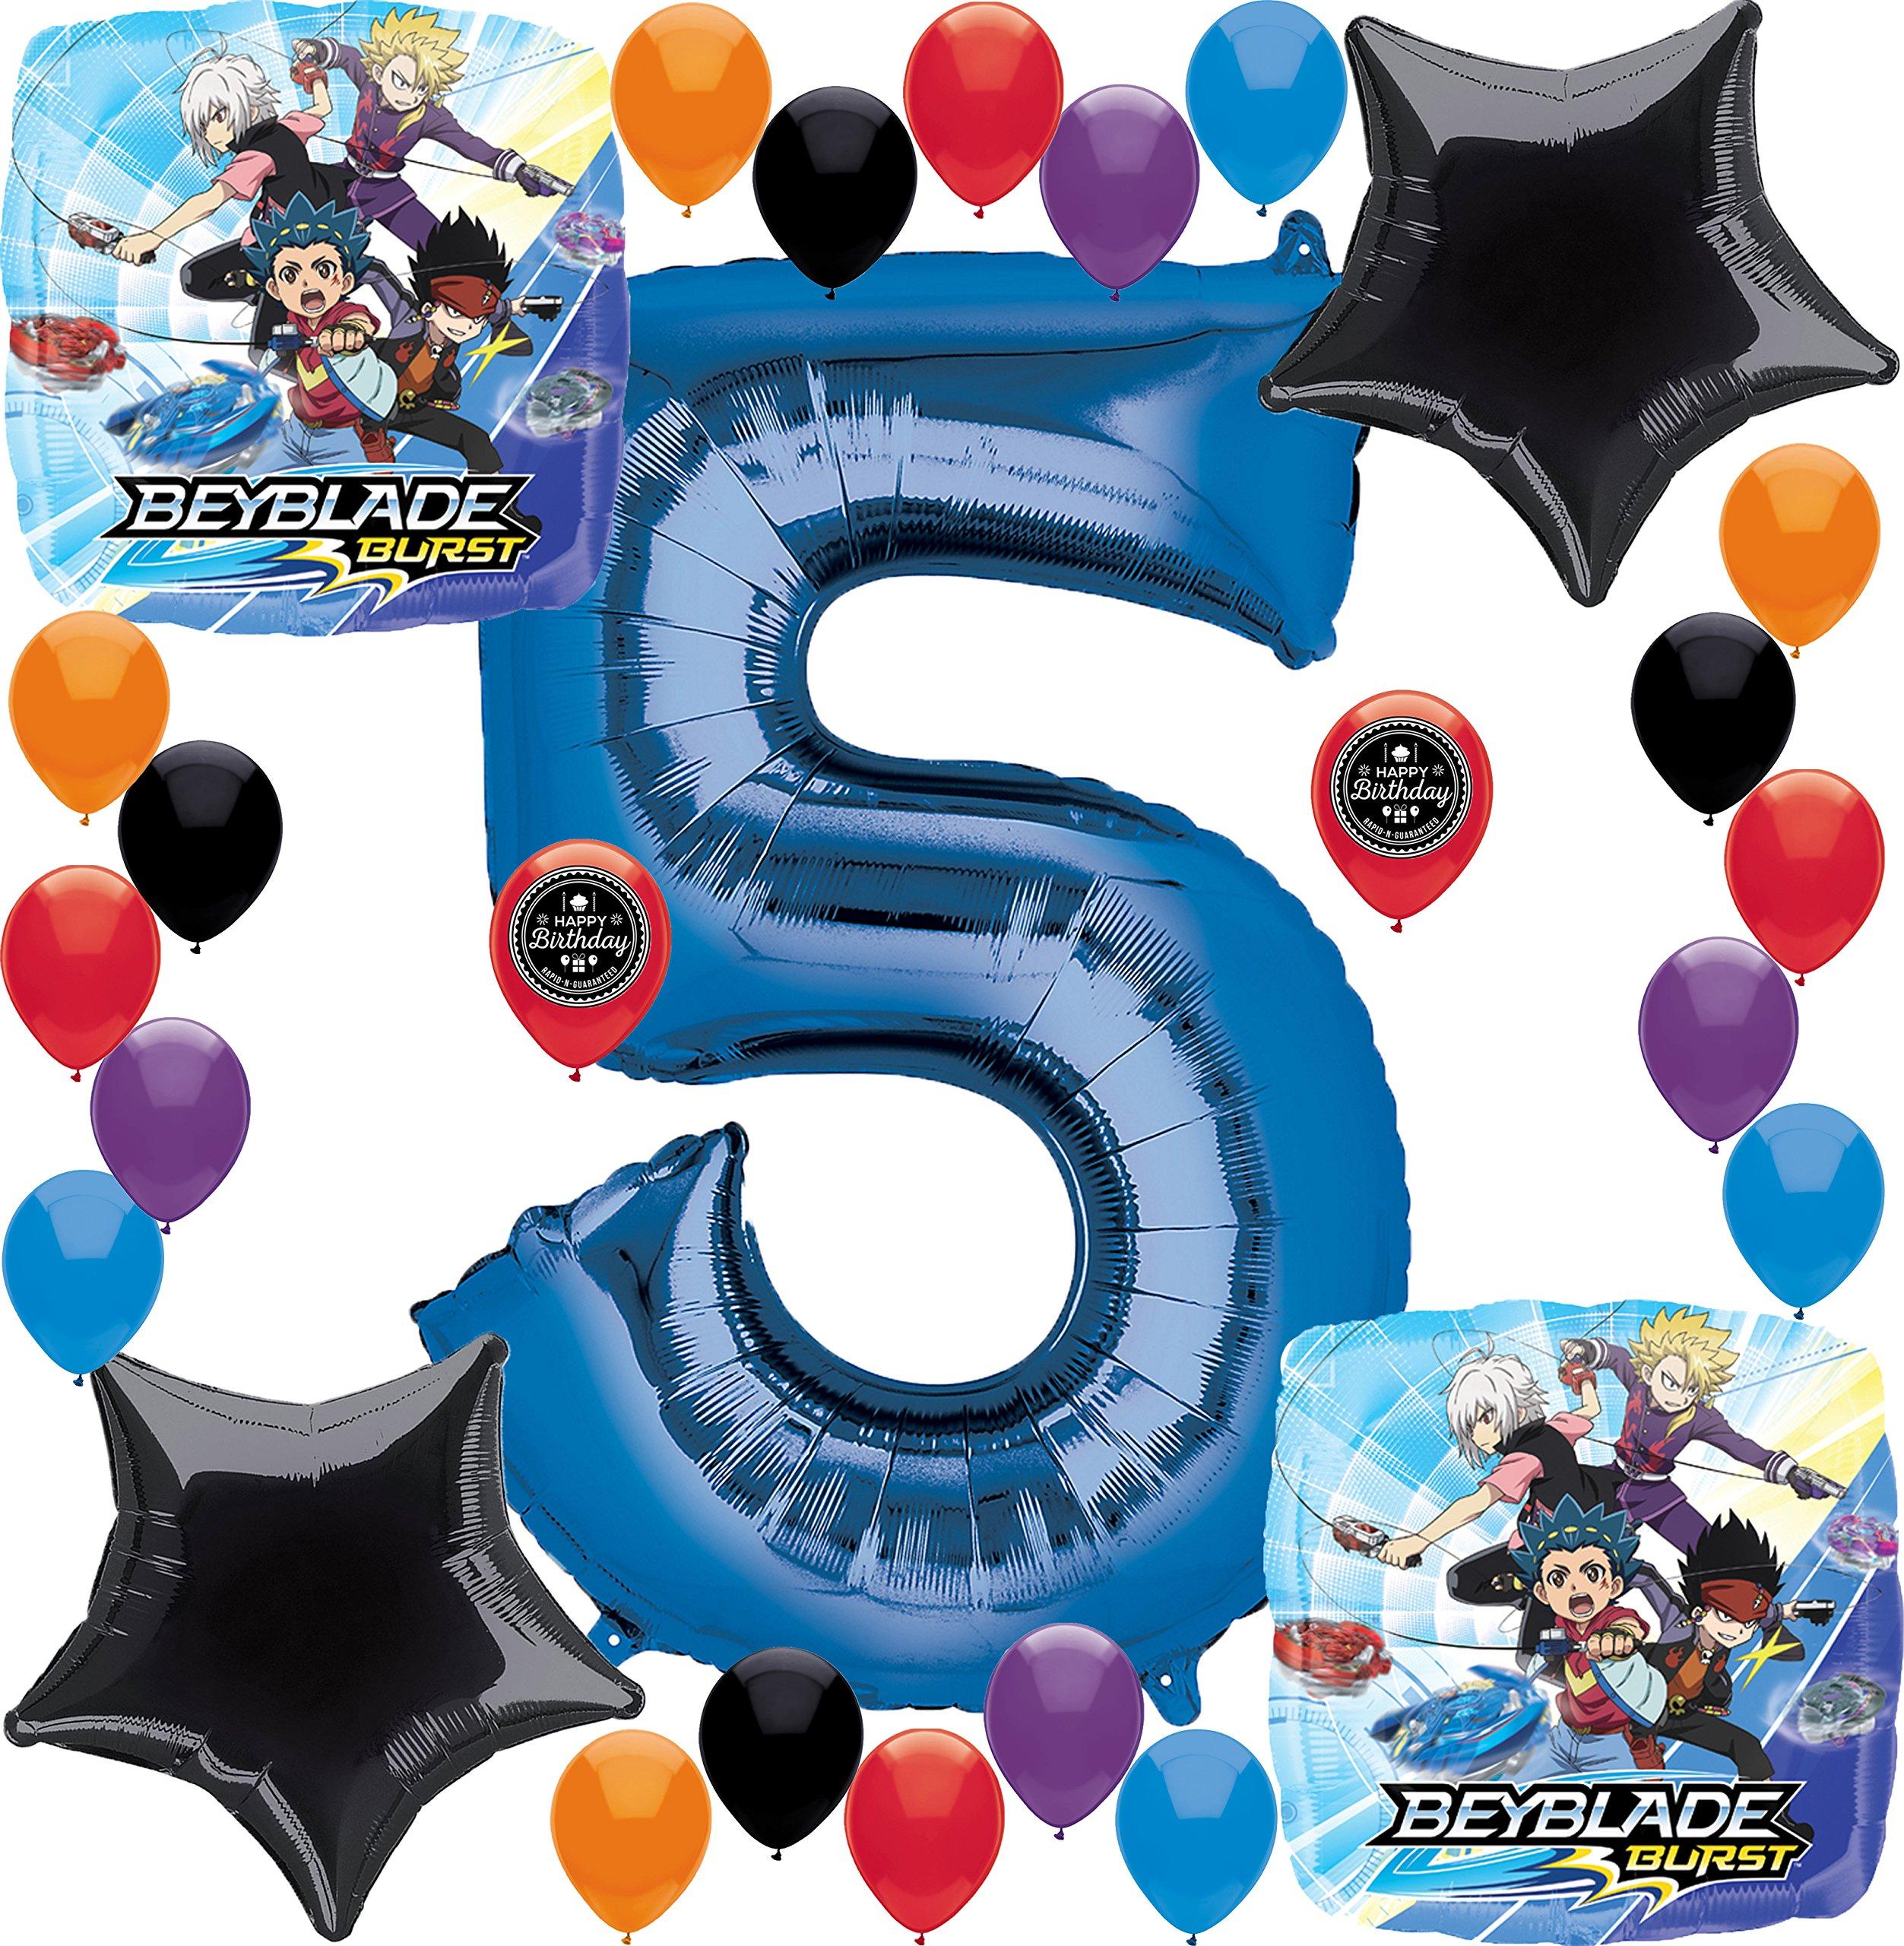 Combined Brands Beyblade Burst Party Supplies Birthday Balloon Decorations Bu...